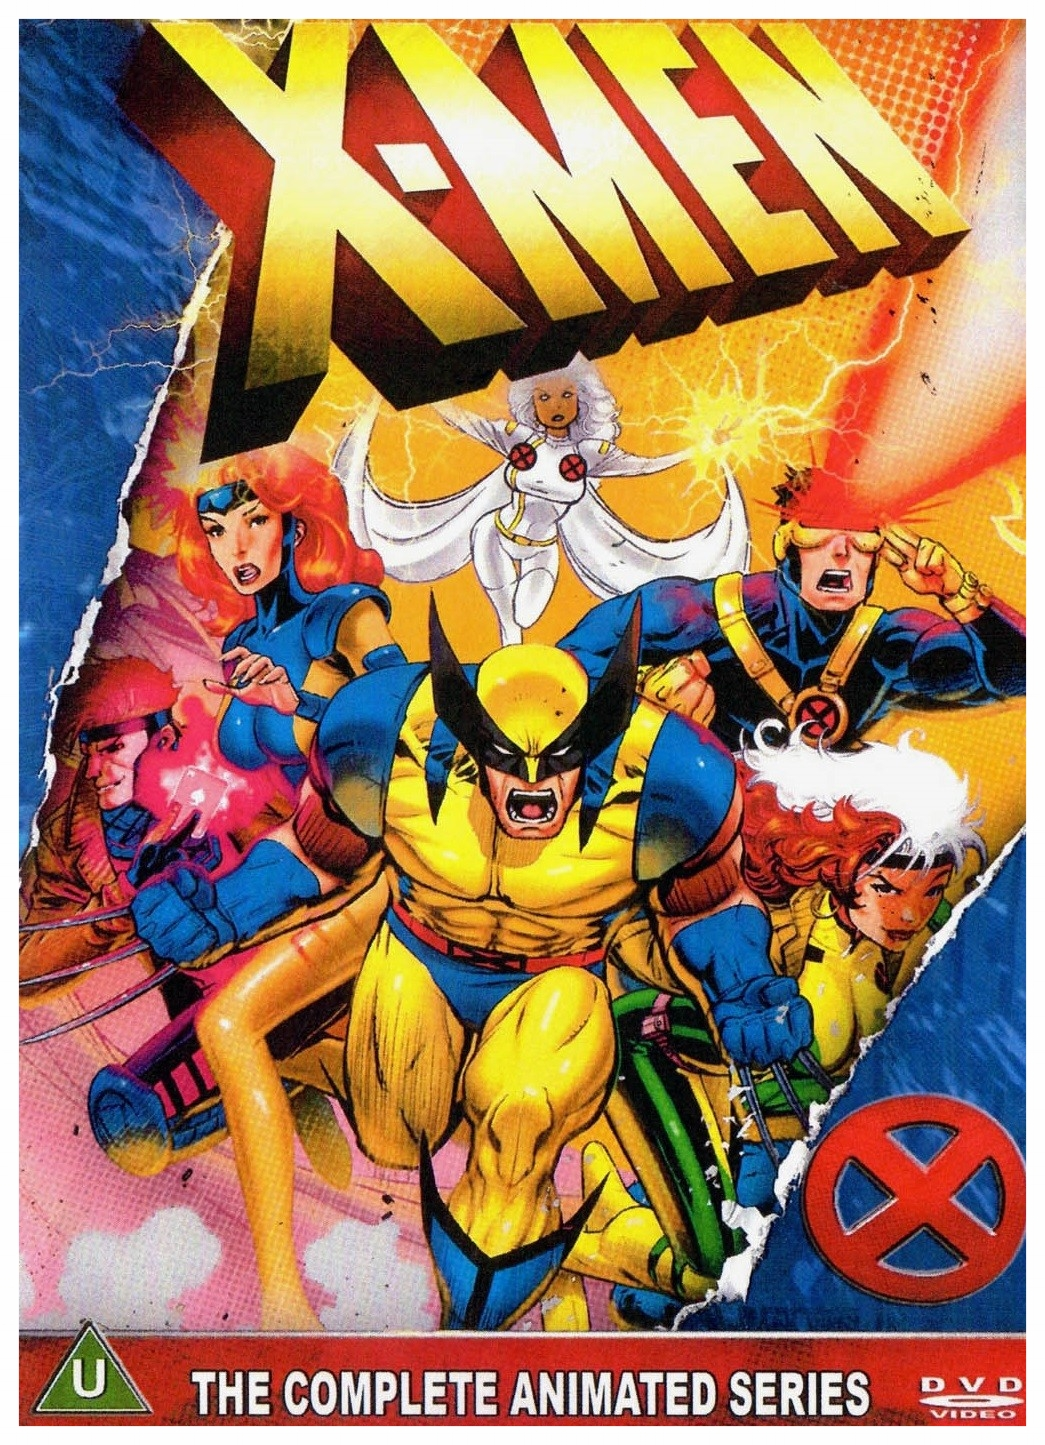 1990-s-x-men-animated-cartoon-series-complete-5-season-set.jpg